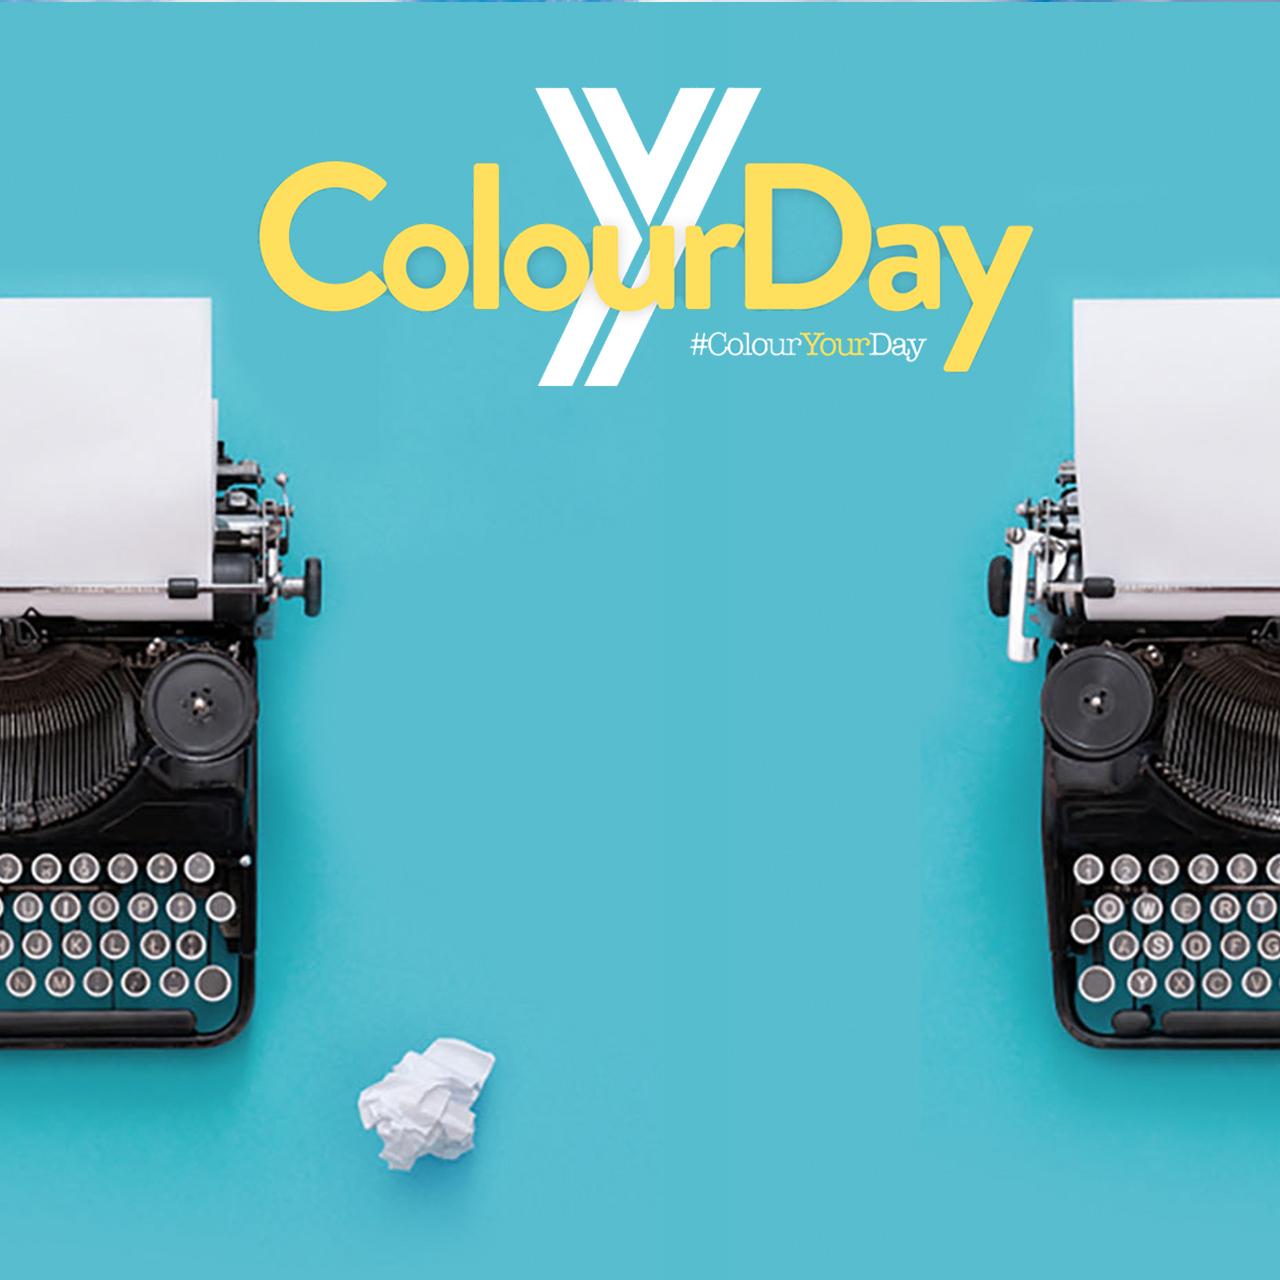 Colour Your Day: Tα πιο χρωματιστά νέα βρίσκονται εδώ!